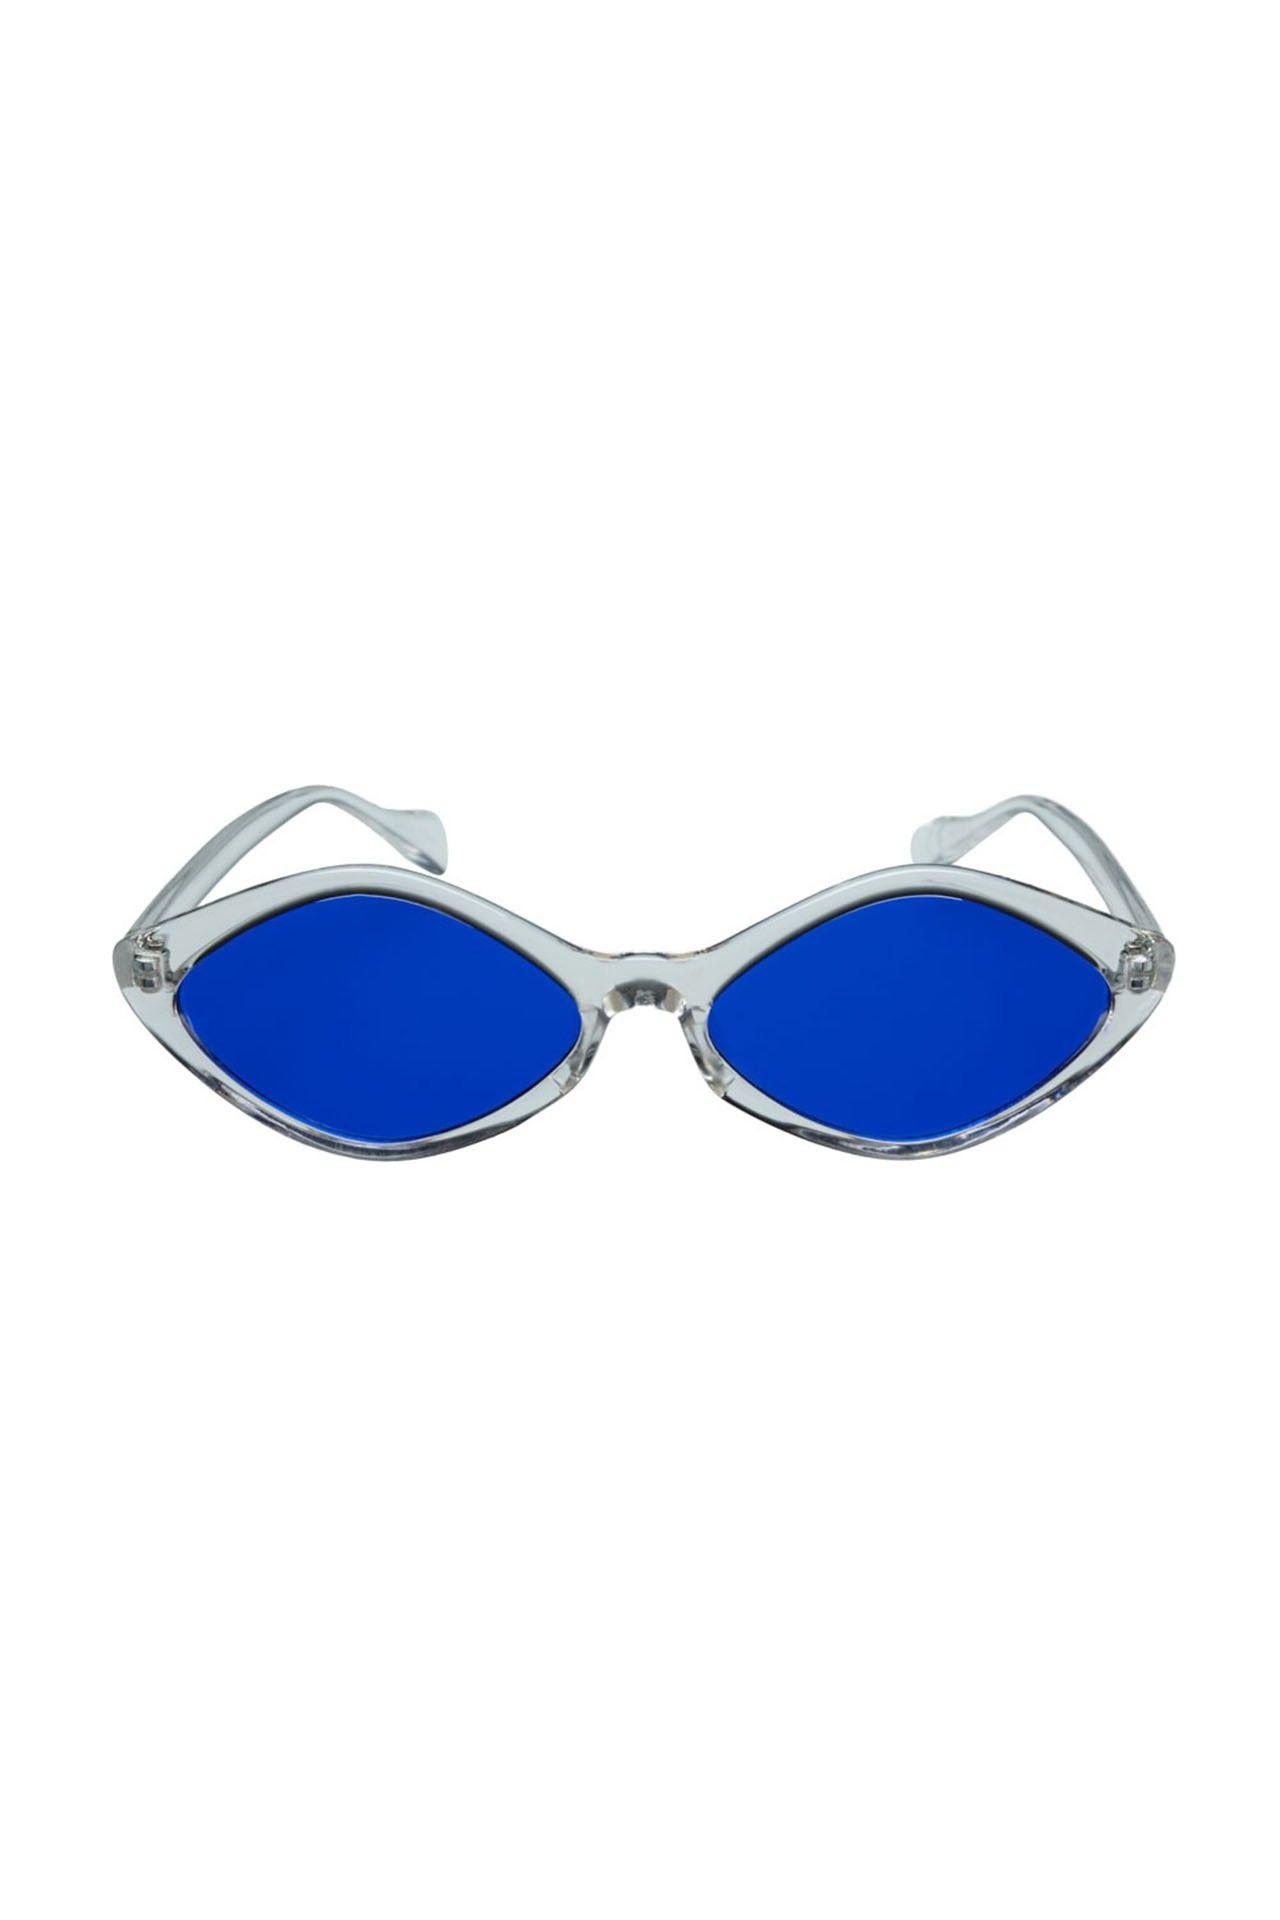 Afbeelding van Icon Eyewear Zonnebril 20014 Clear C